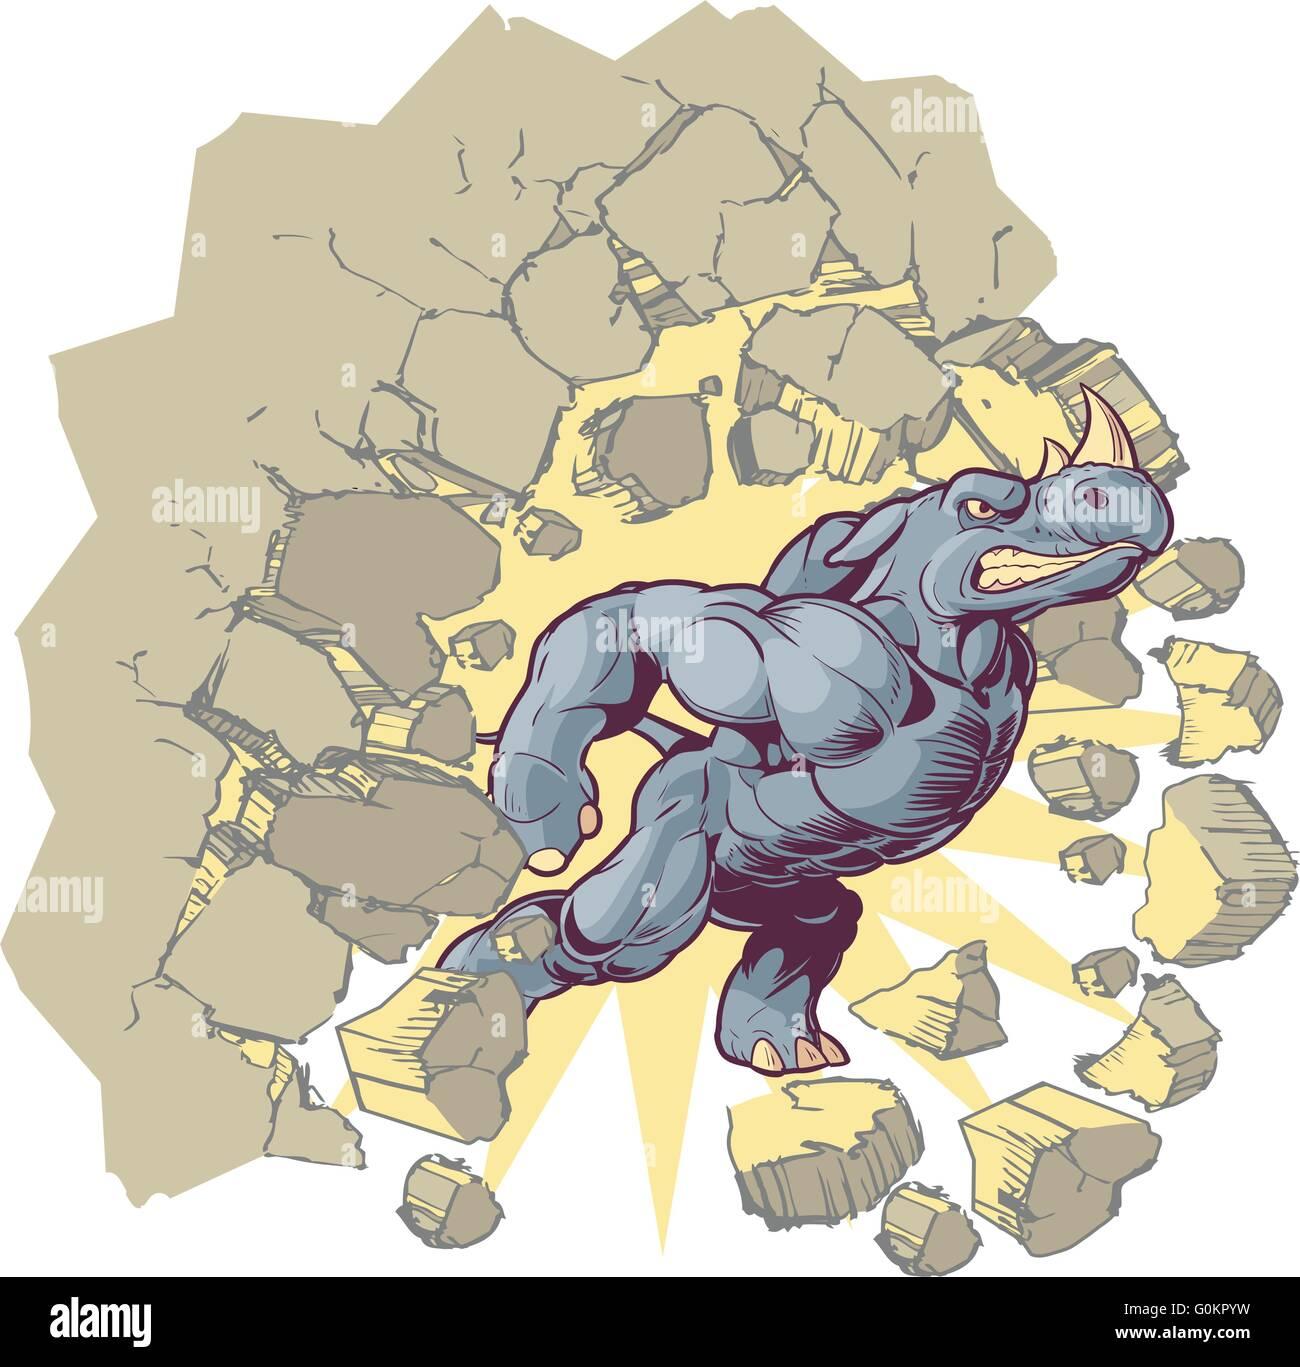 Vector Cartoon Clip Art Illustration of an Anthropomorphic Mascot Rhino Crashing through a wall. - Stock Image